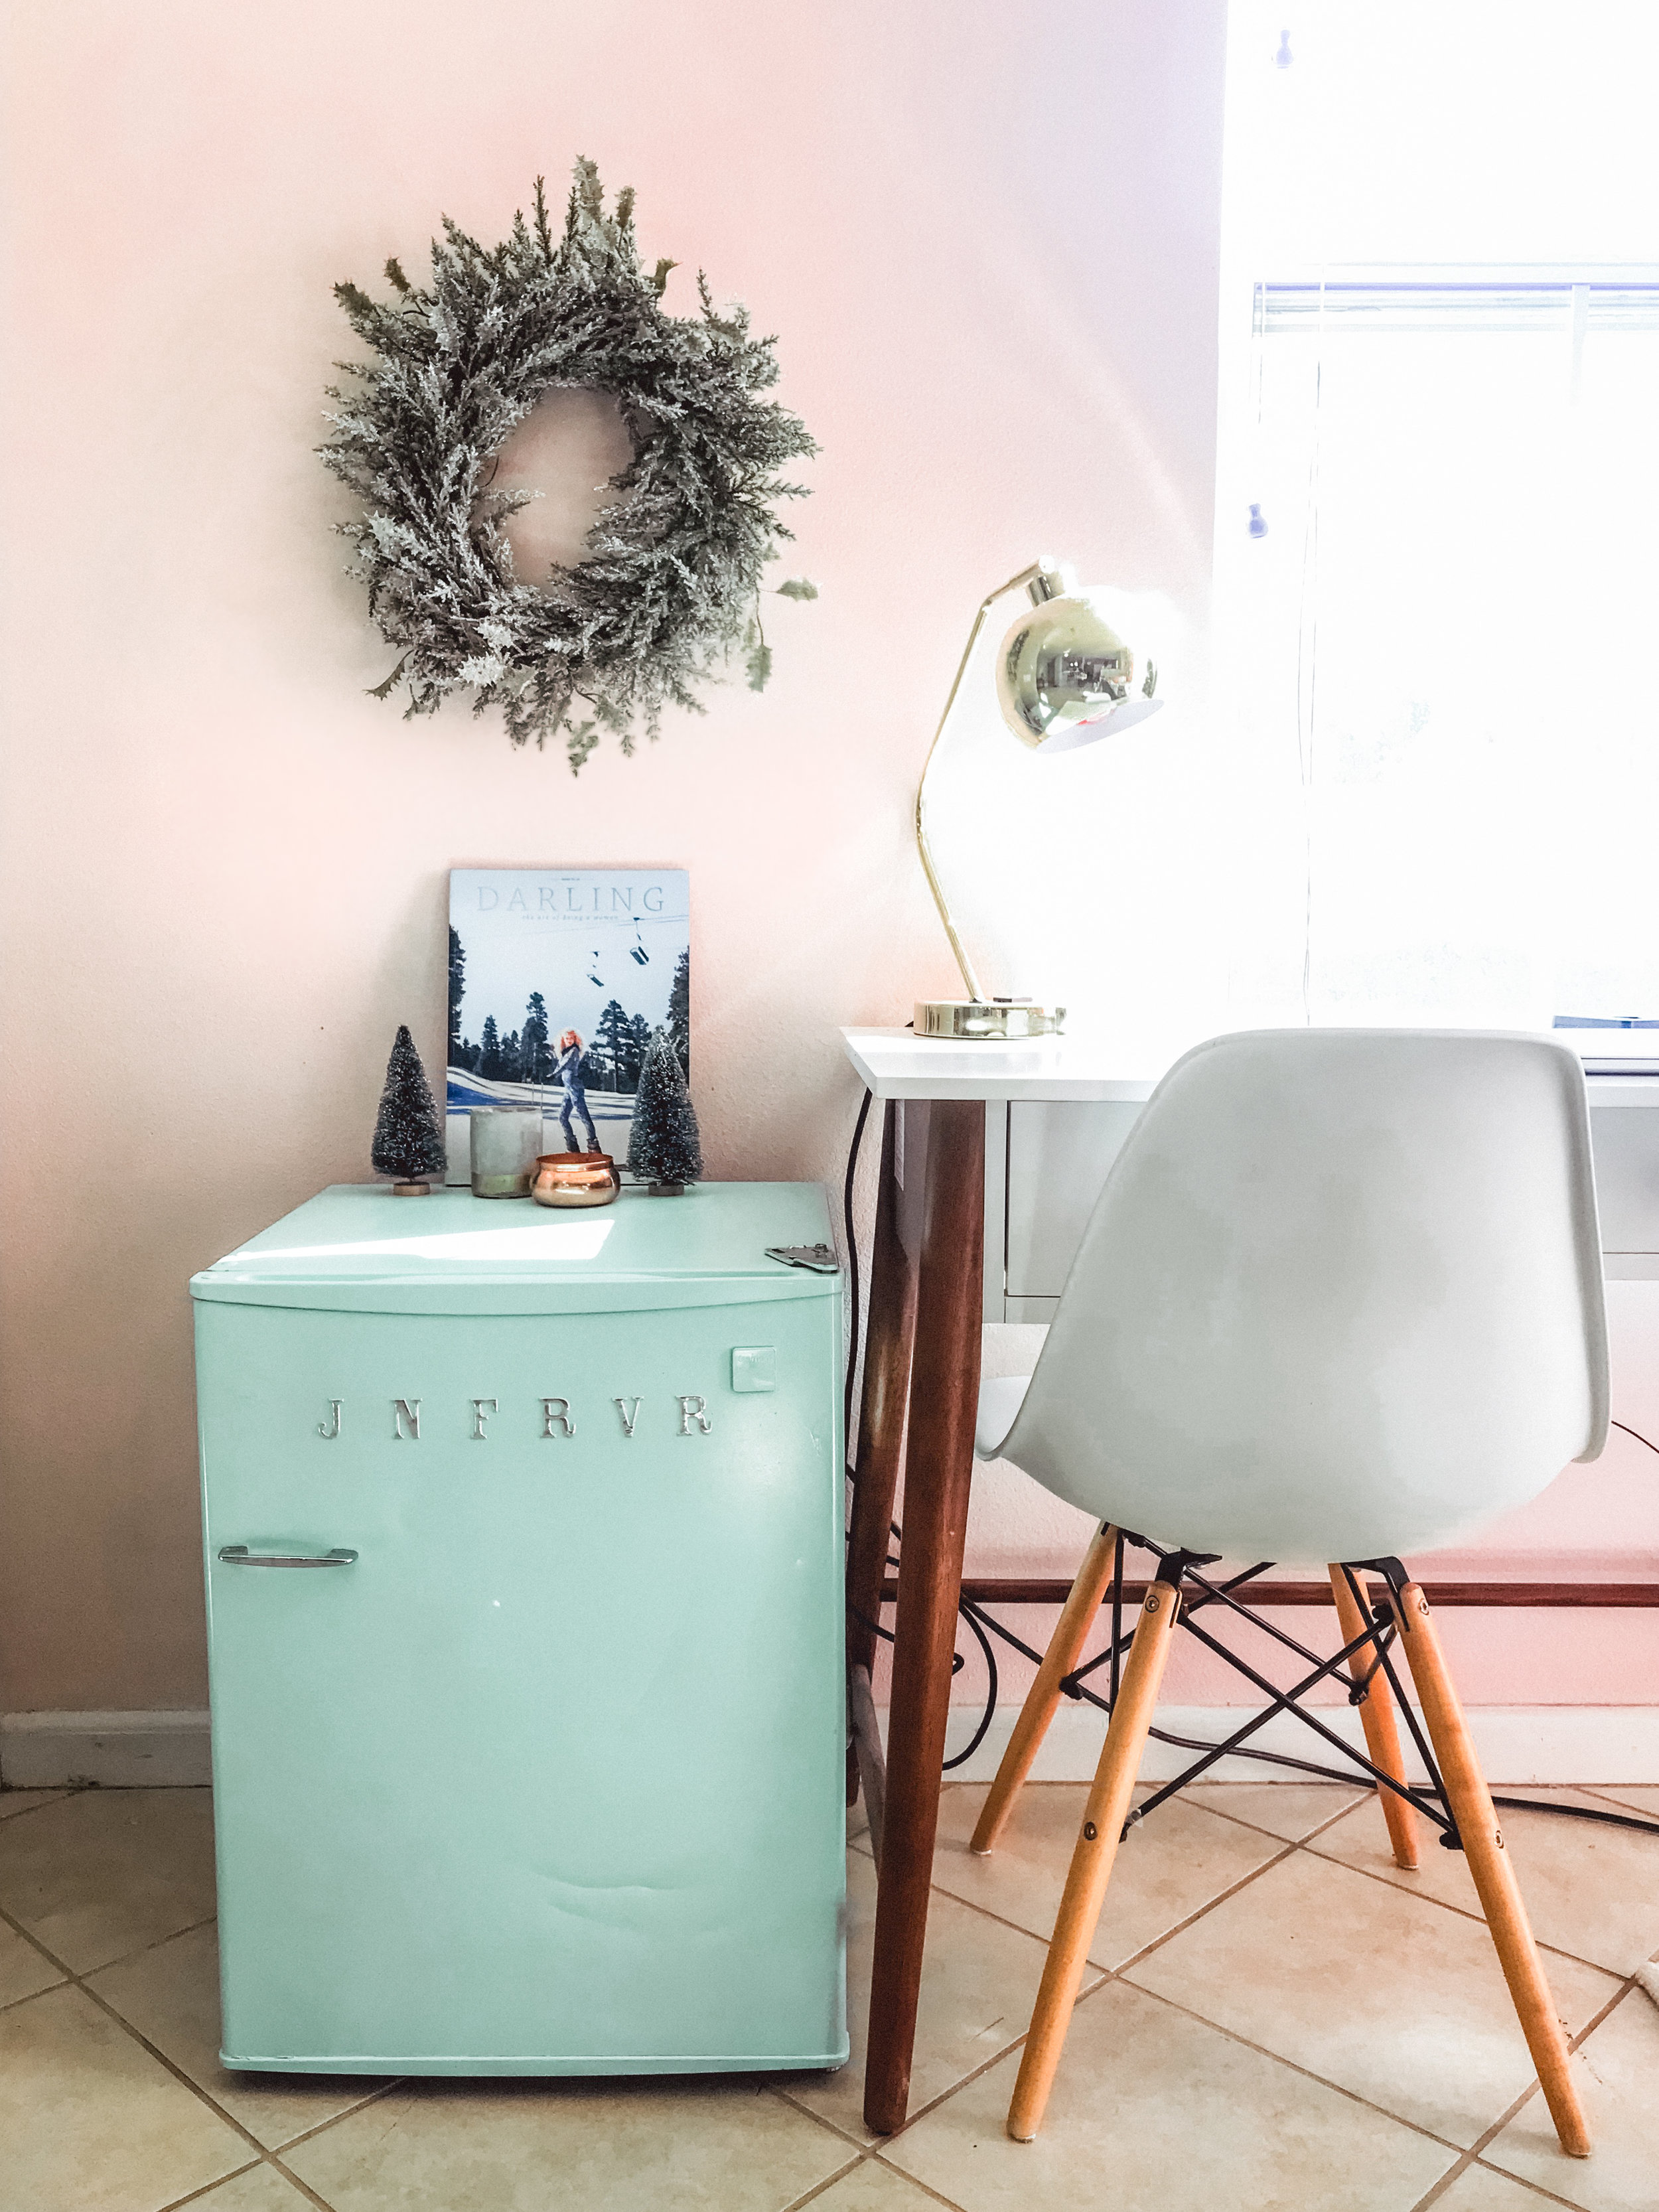 retro-fridge.jpg